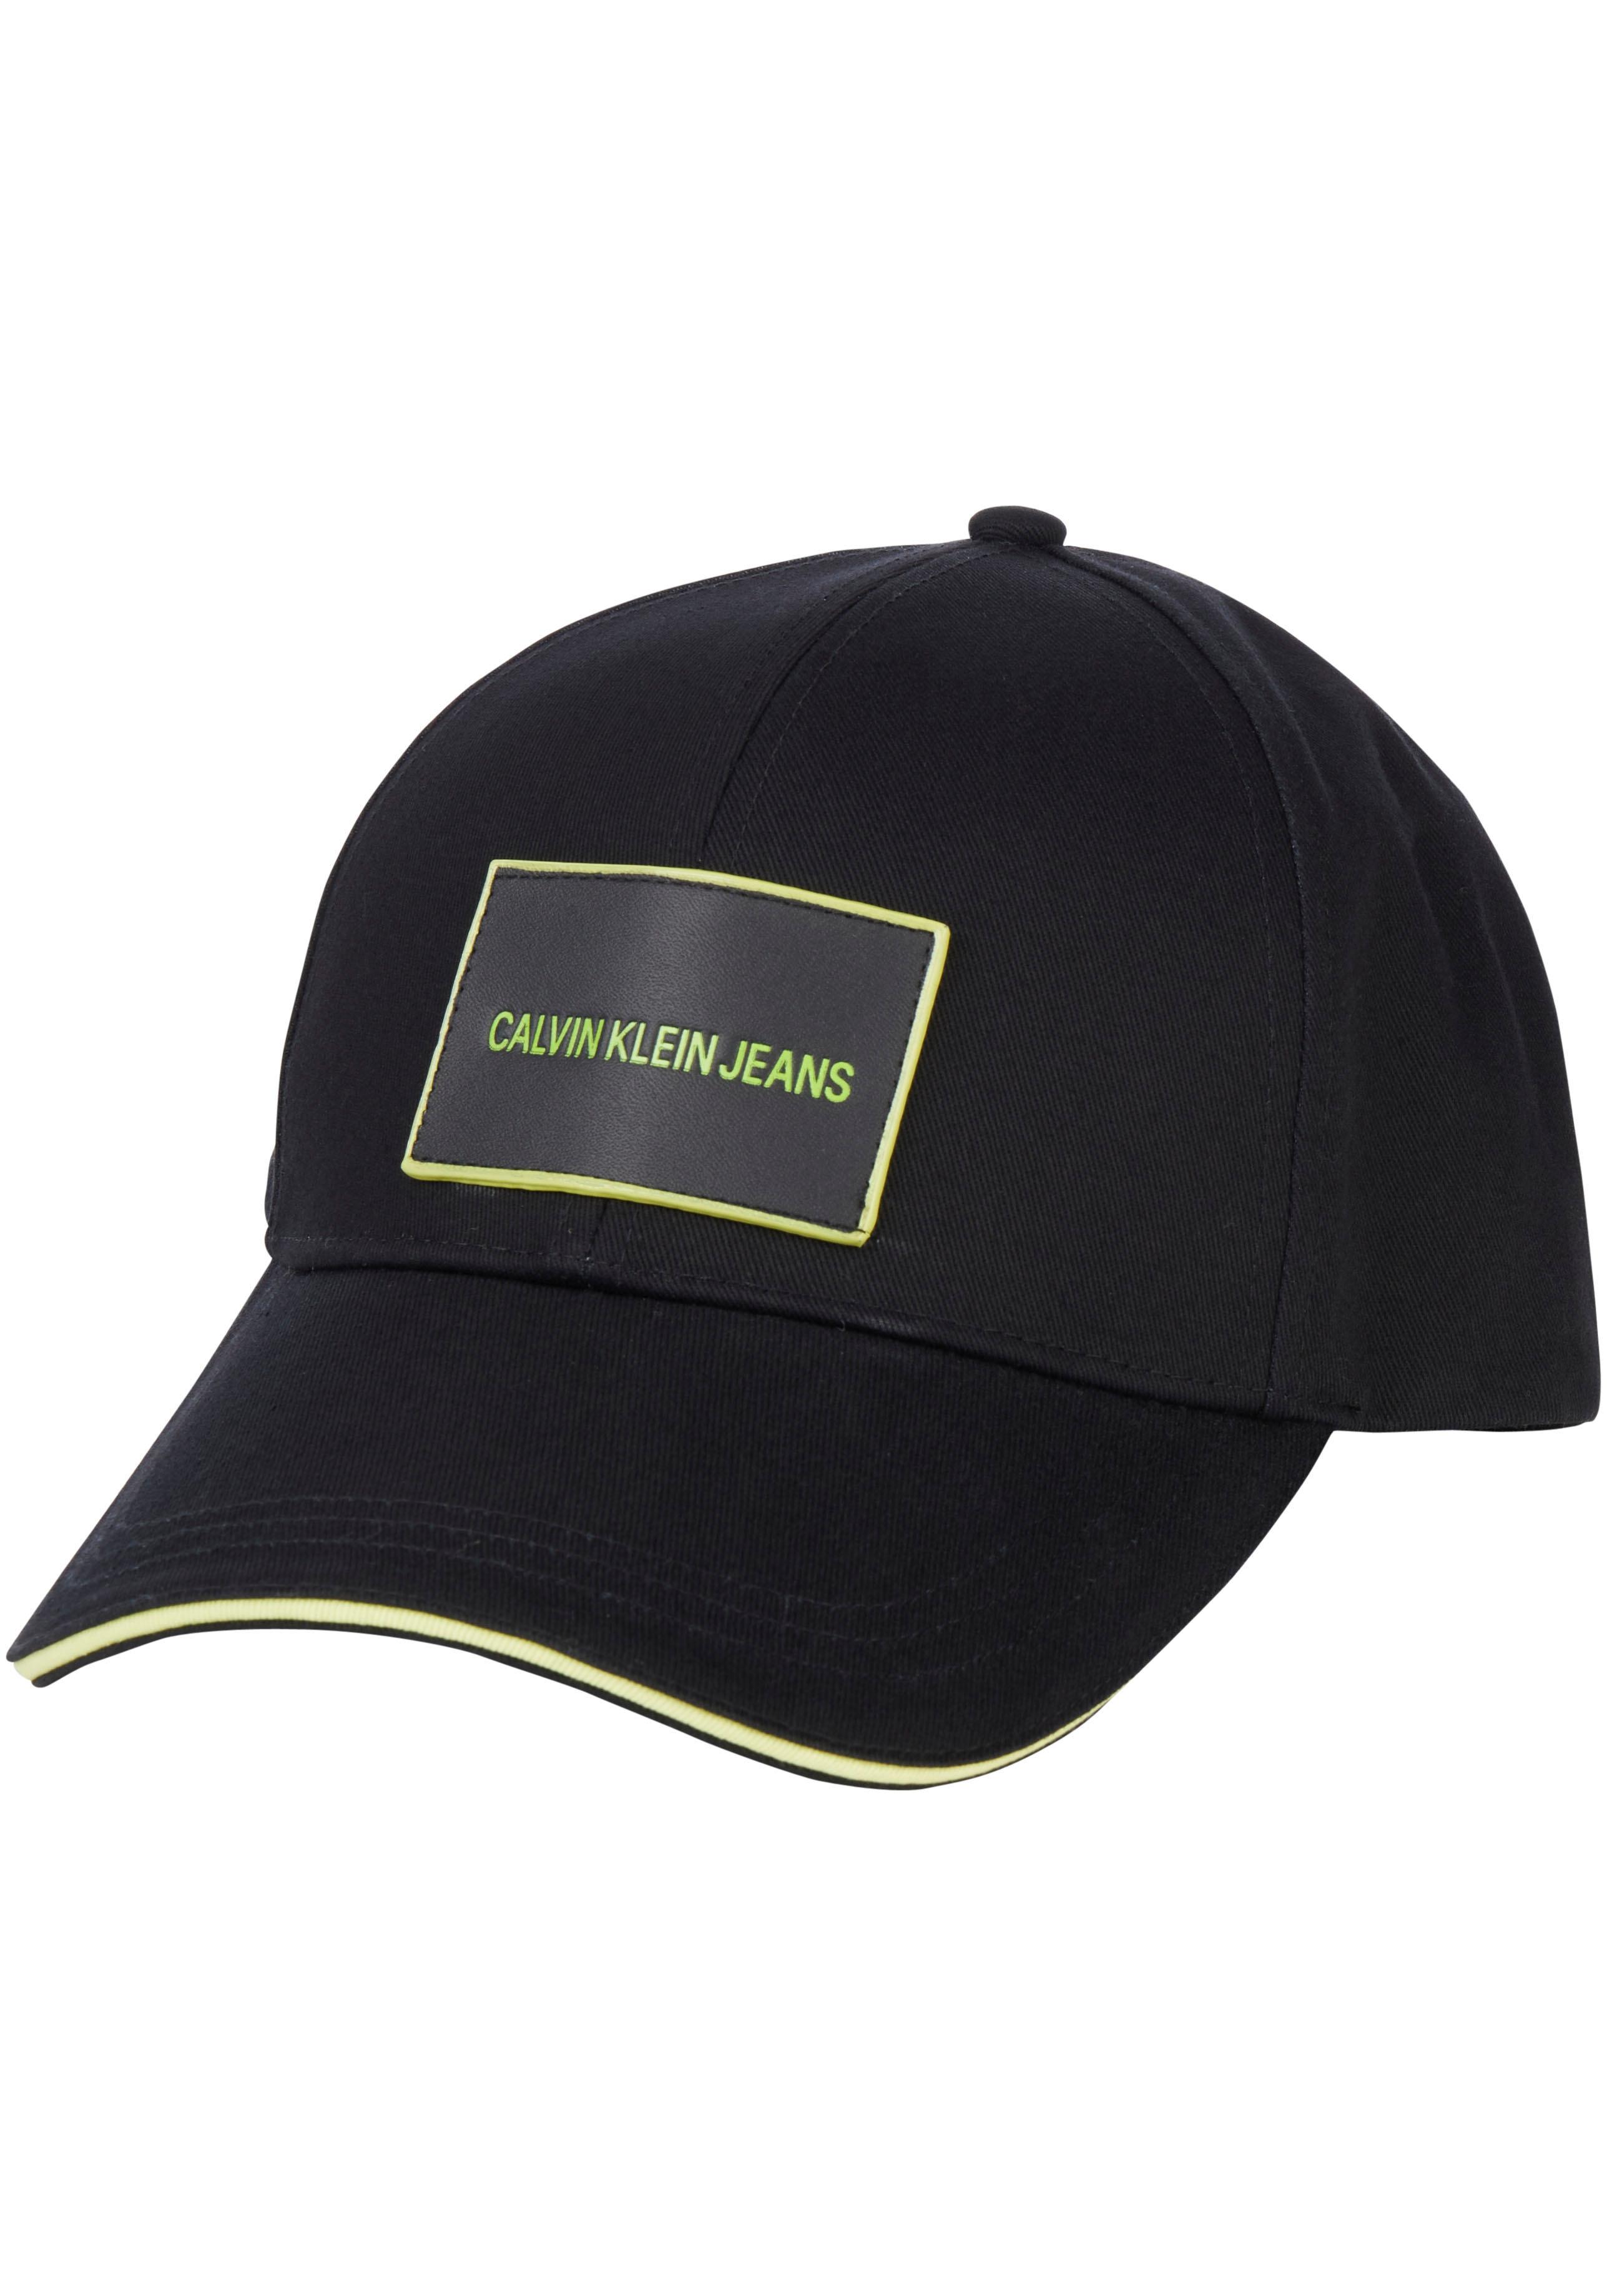 calvin klein jeans -  Baseball Cap, PATCH CAP